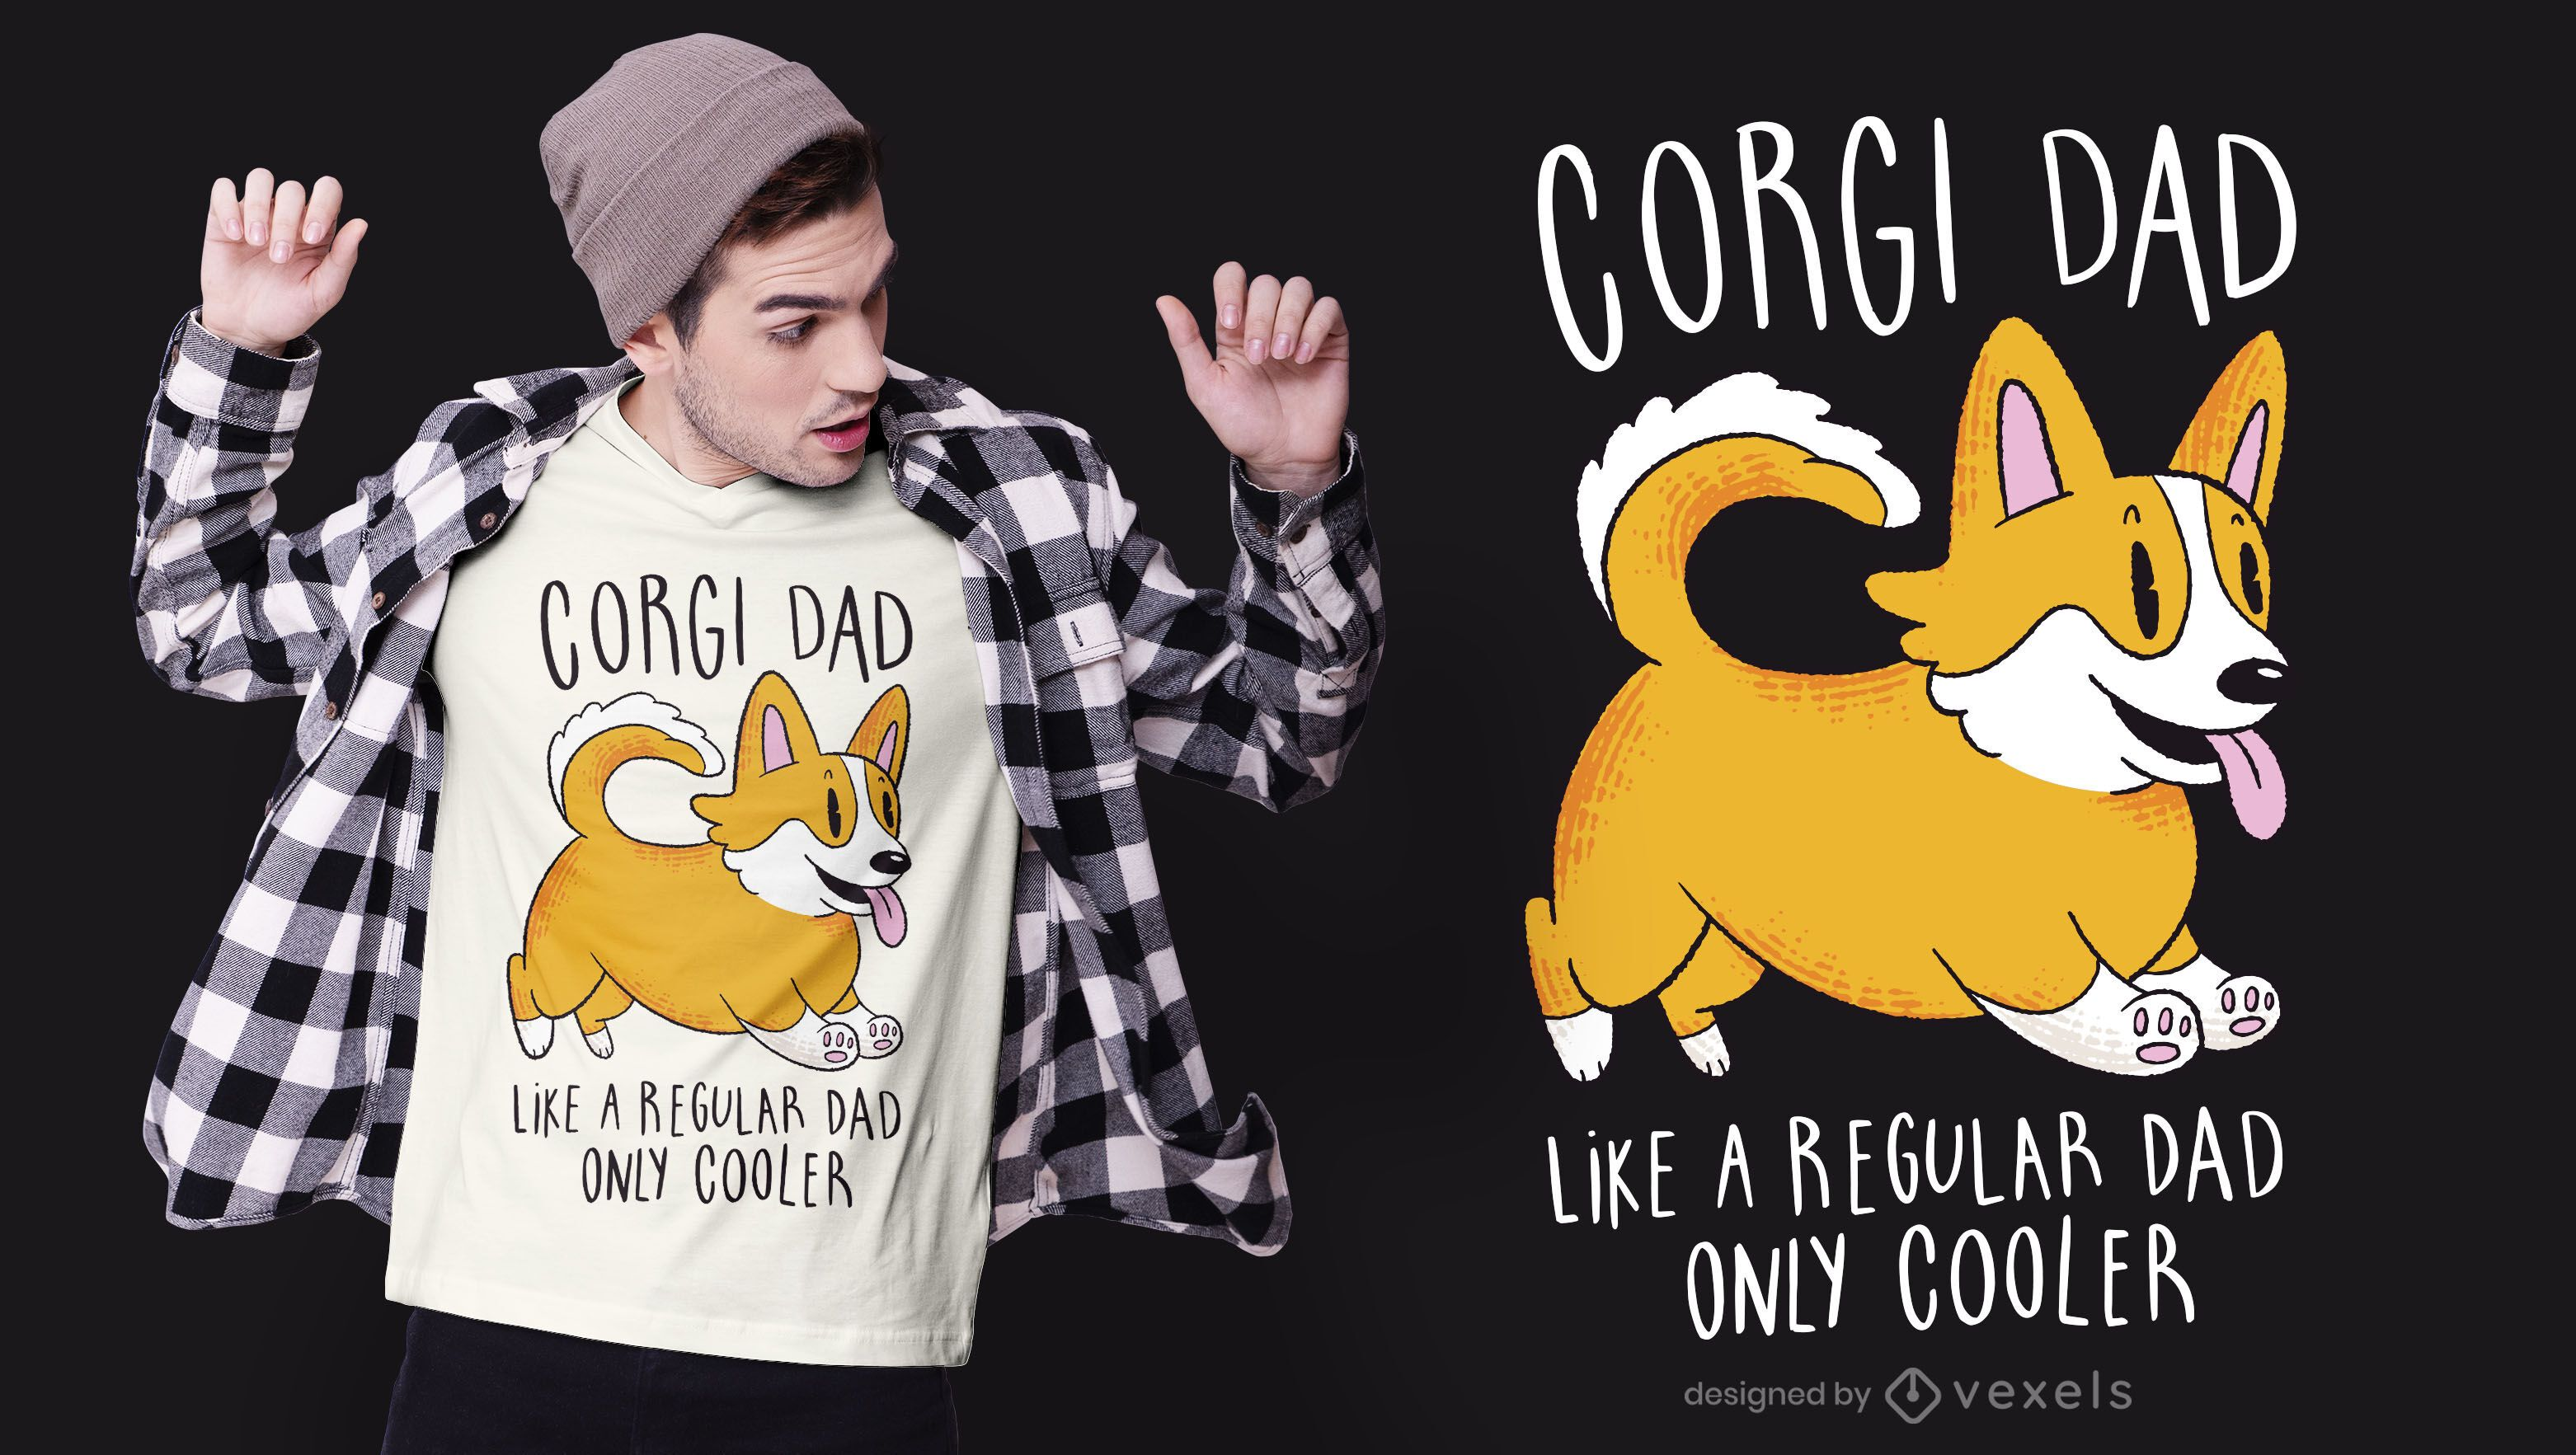 Corgi dad t-shirt design